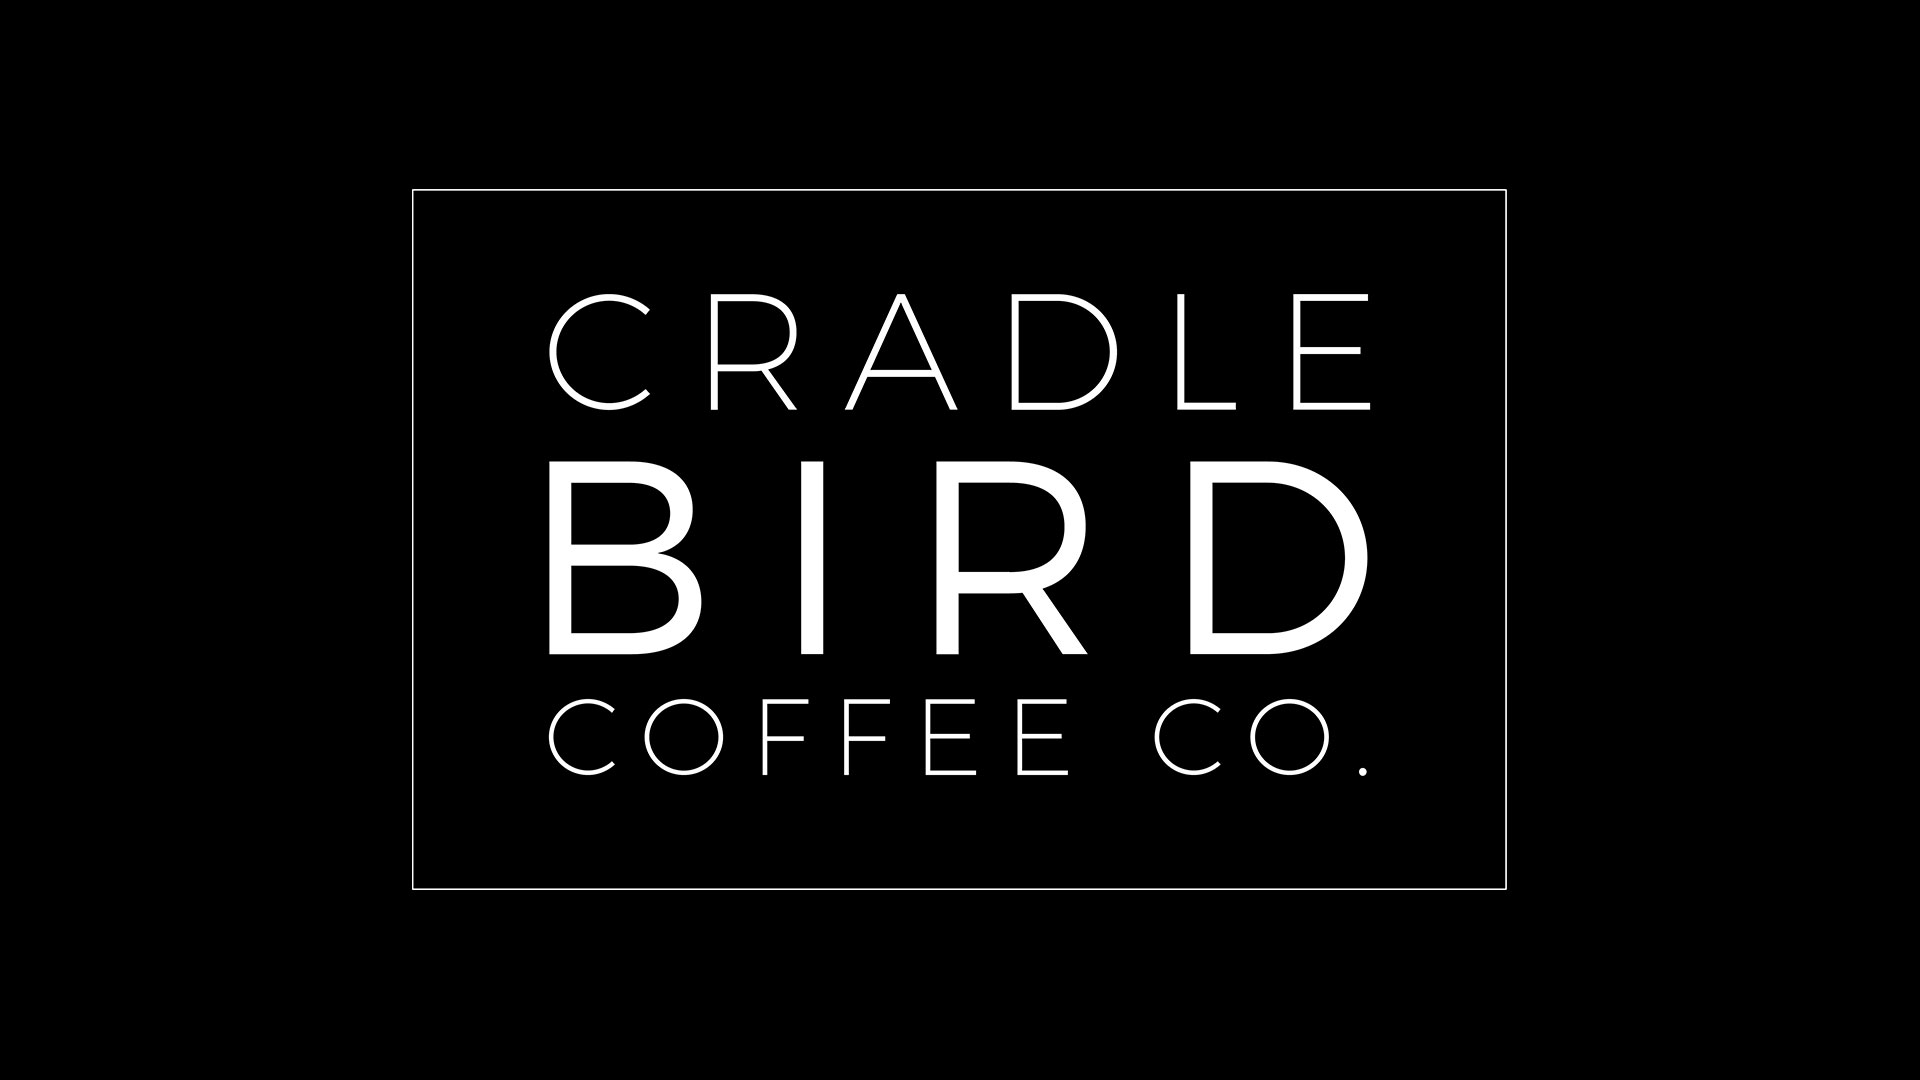 Cradle Bird Coffee Company